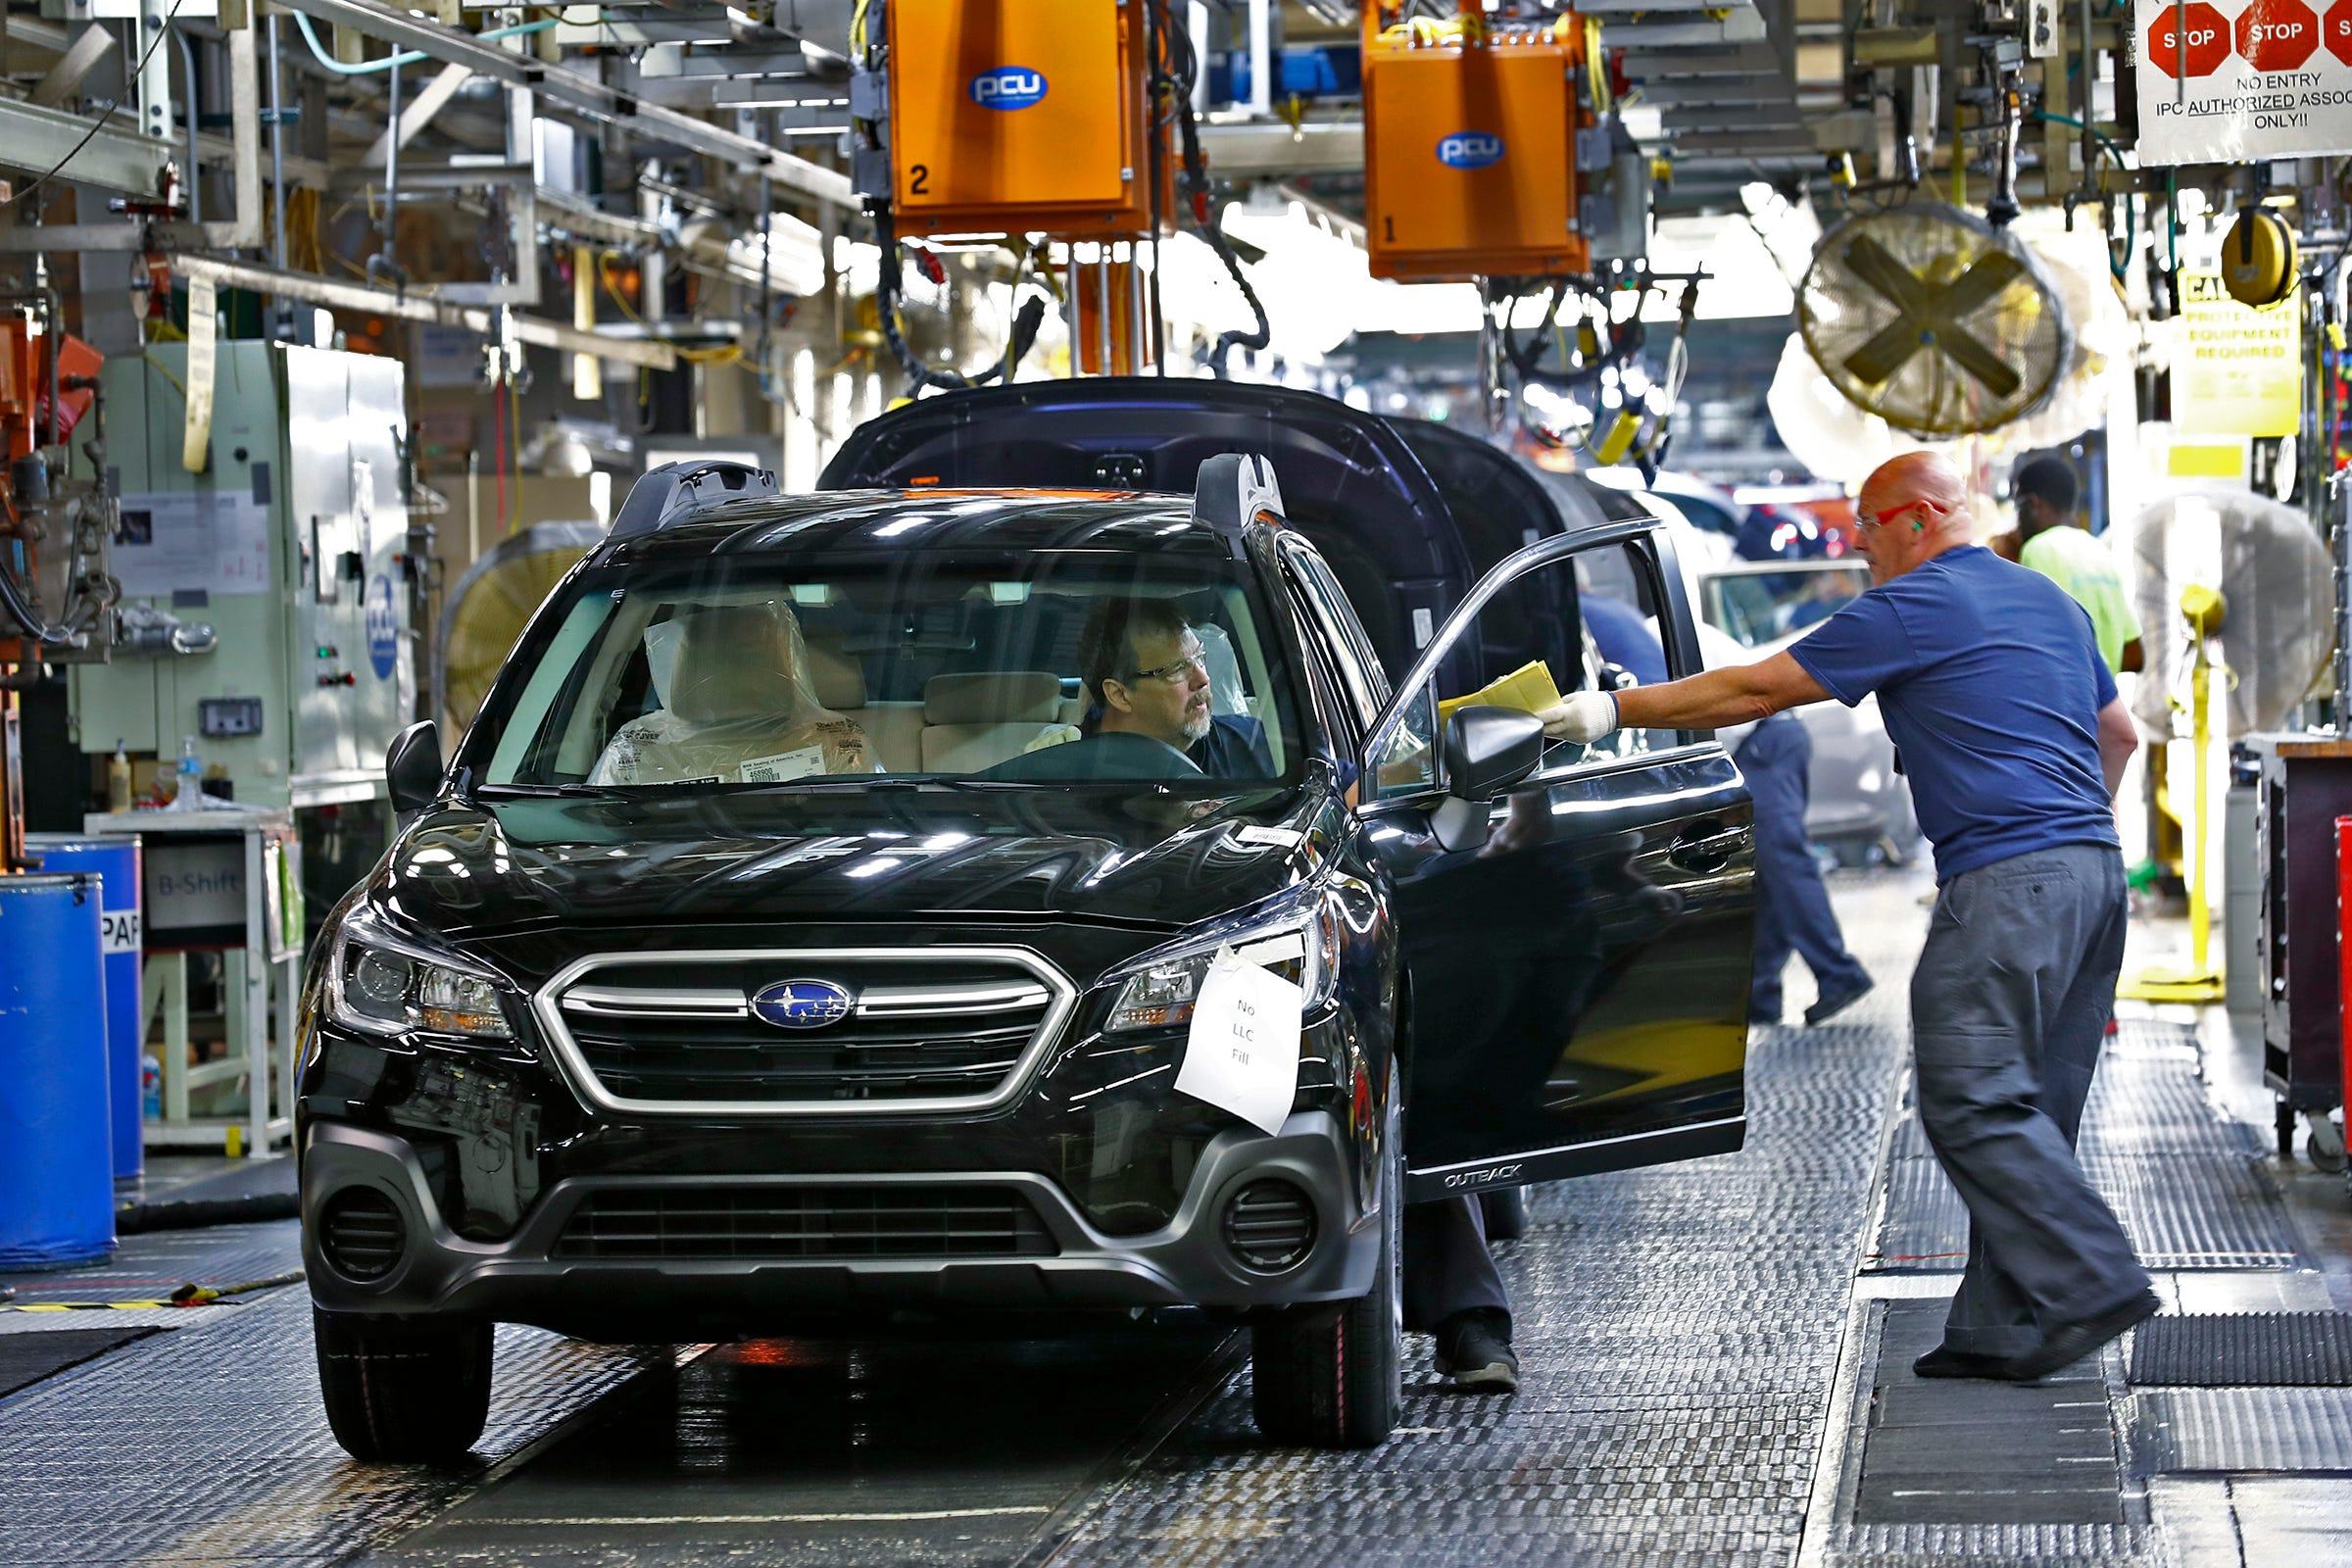 Subaru plant goes landfill free: How Indiana factory reused